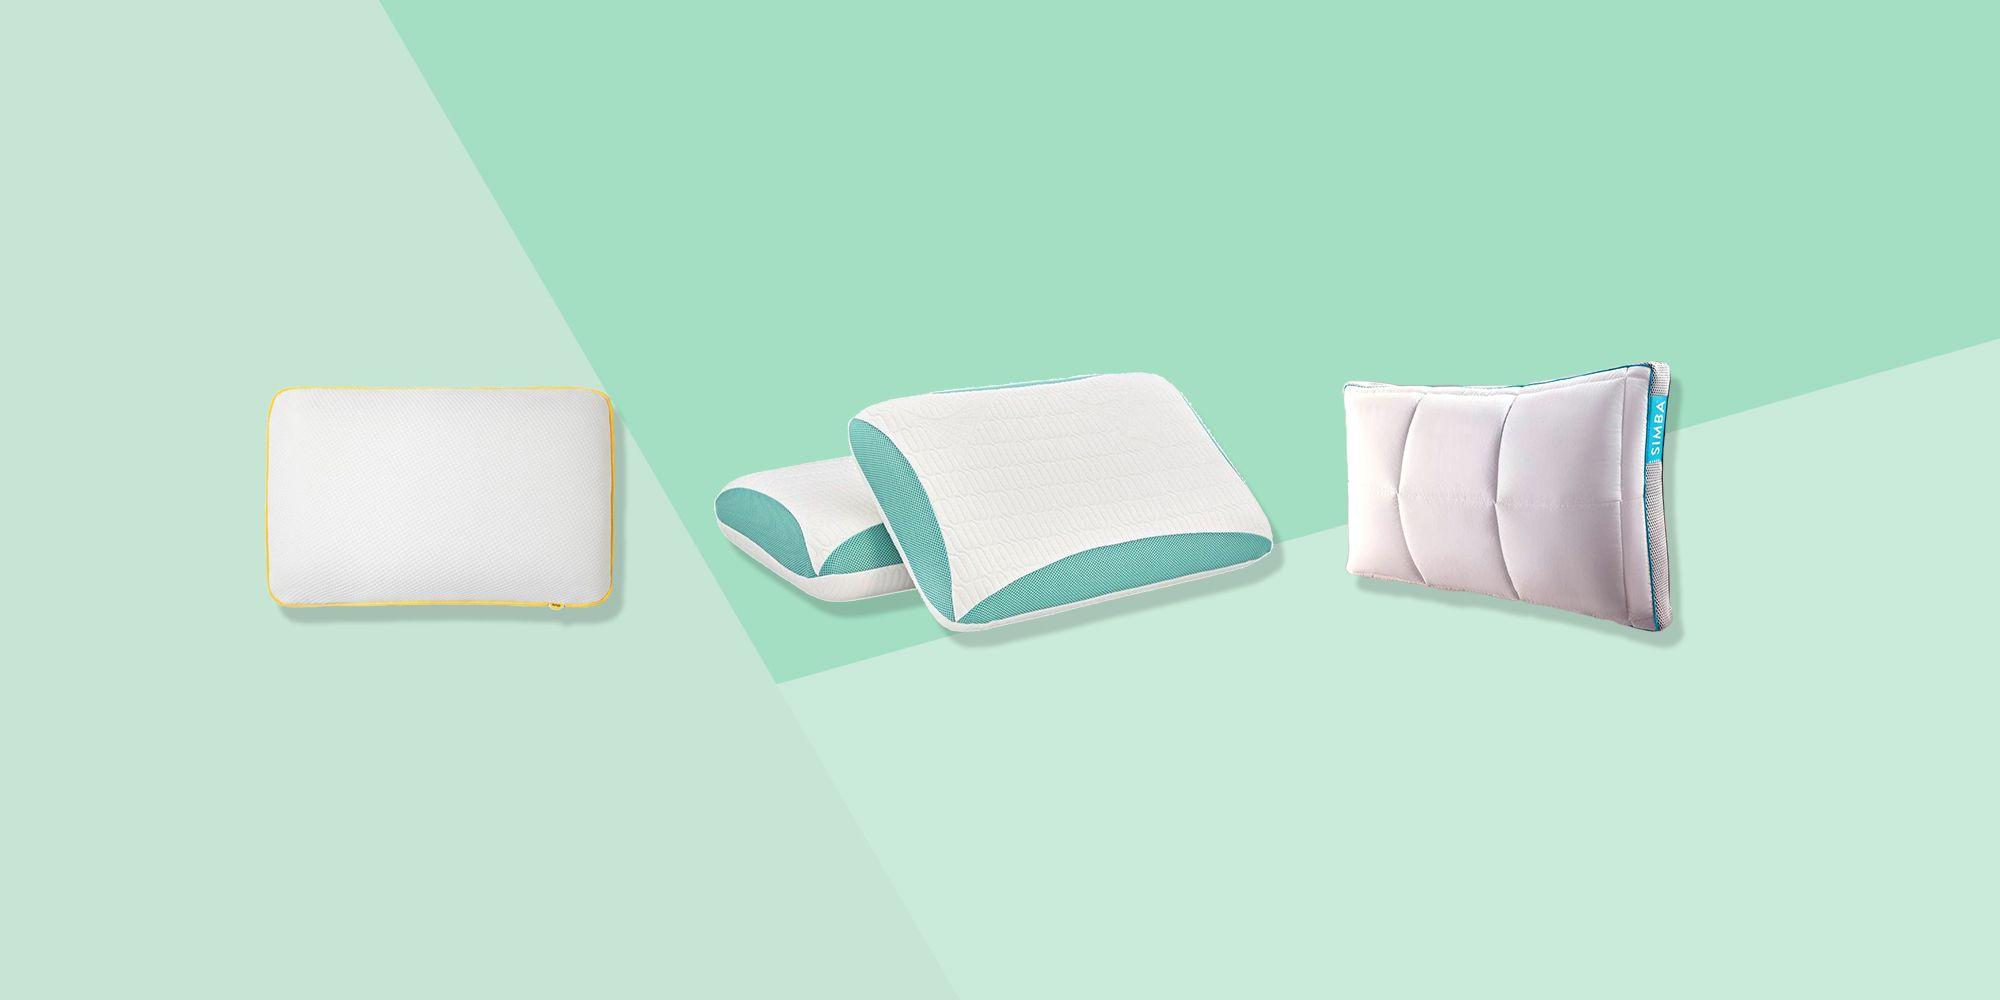 6 memory foam pillows to help you sleep better reduce pain